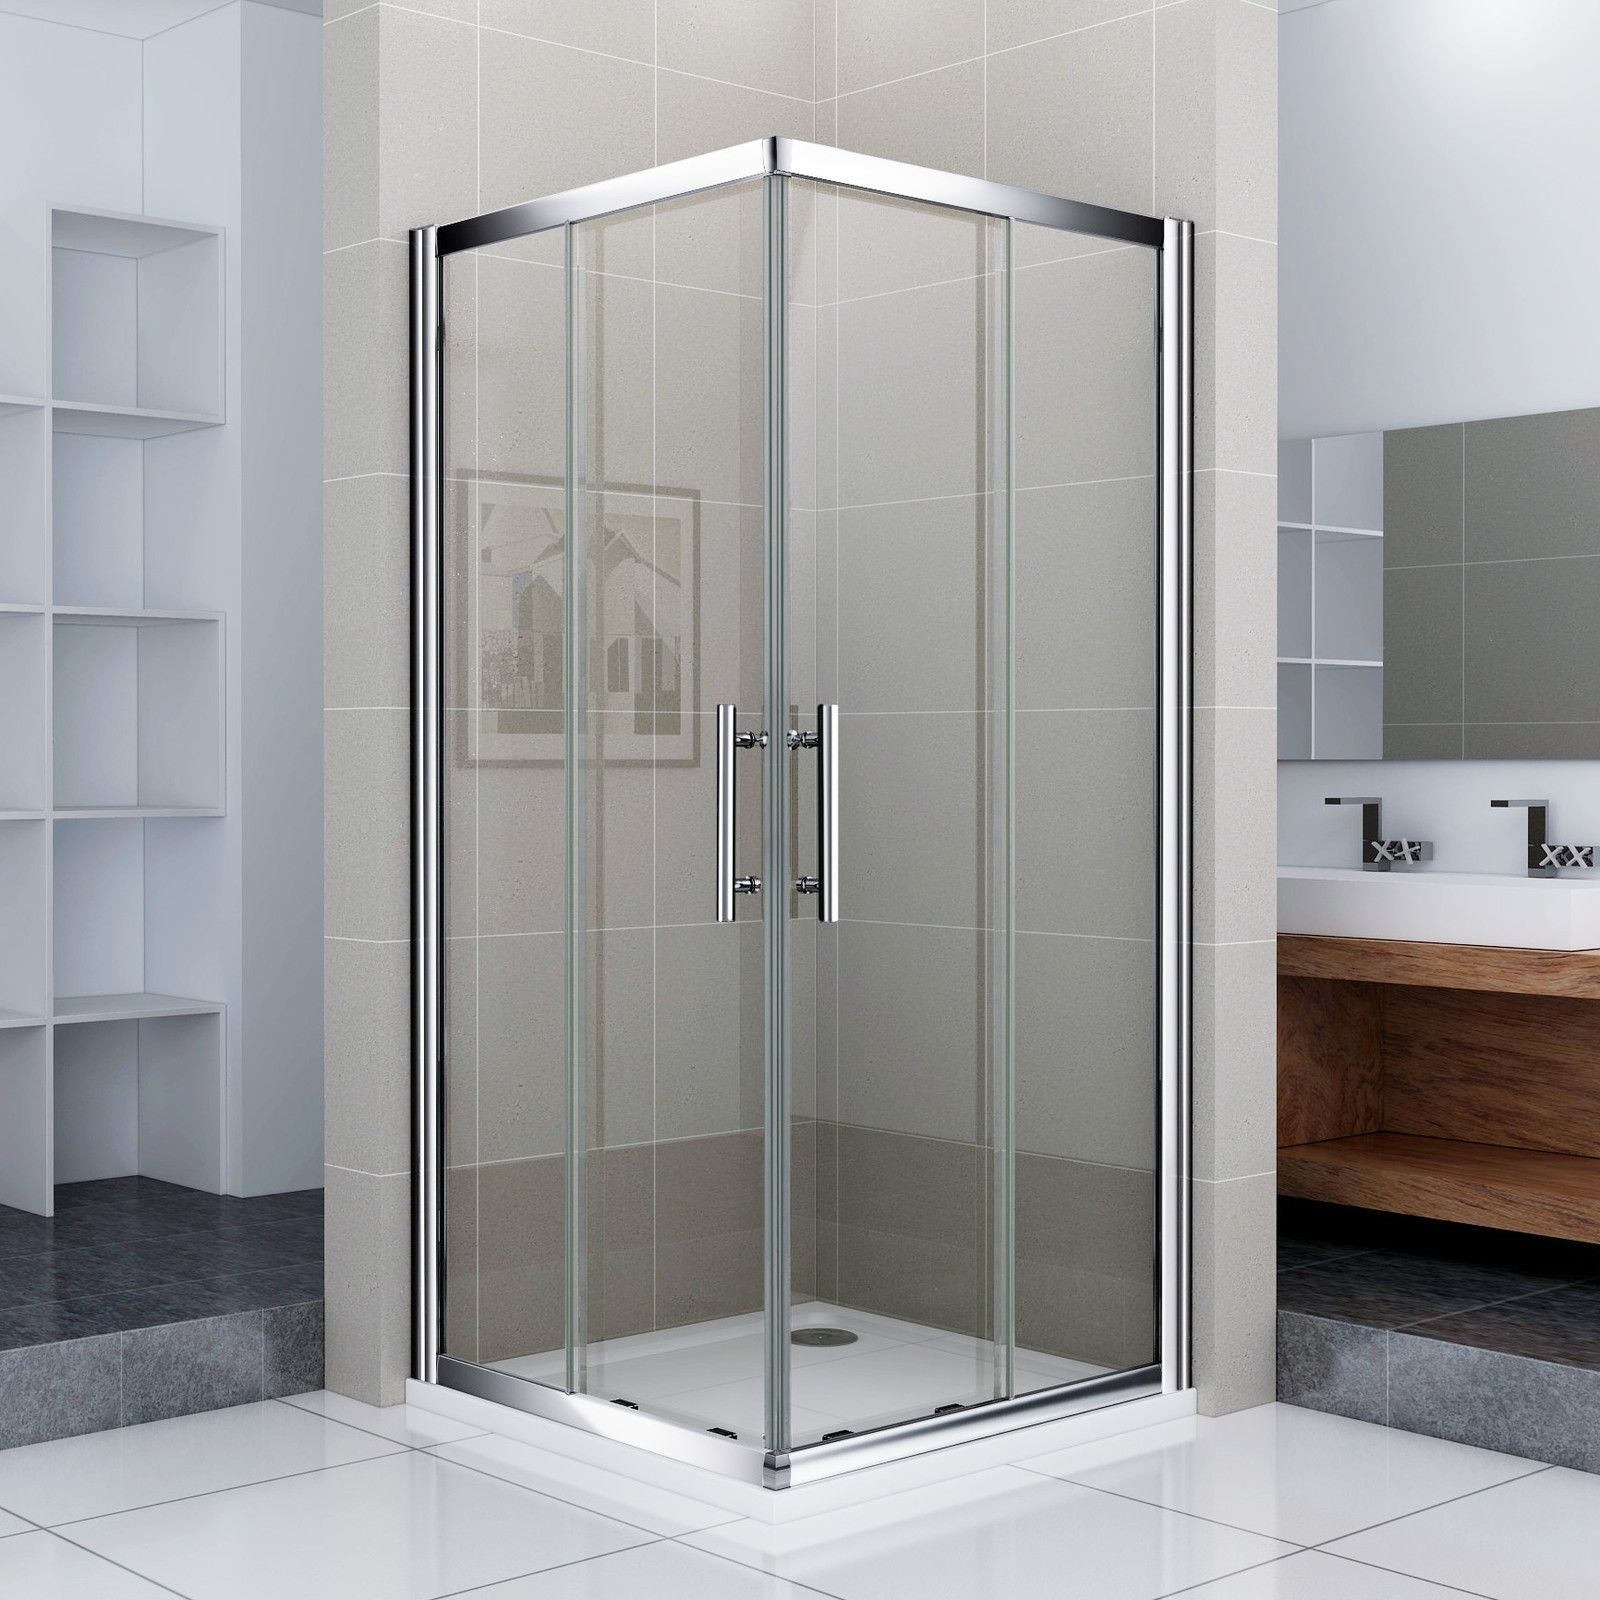 Tempered Duschkabinen 1000 x 1000 mm sliding shower enclosure door corner entry tray